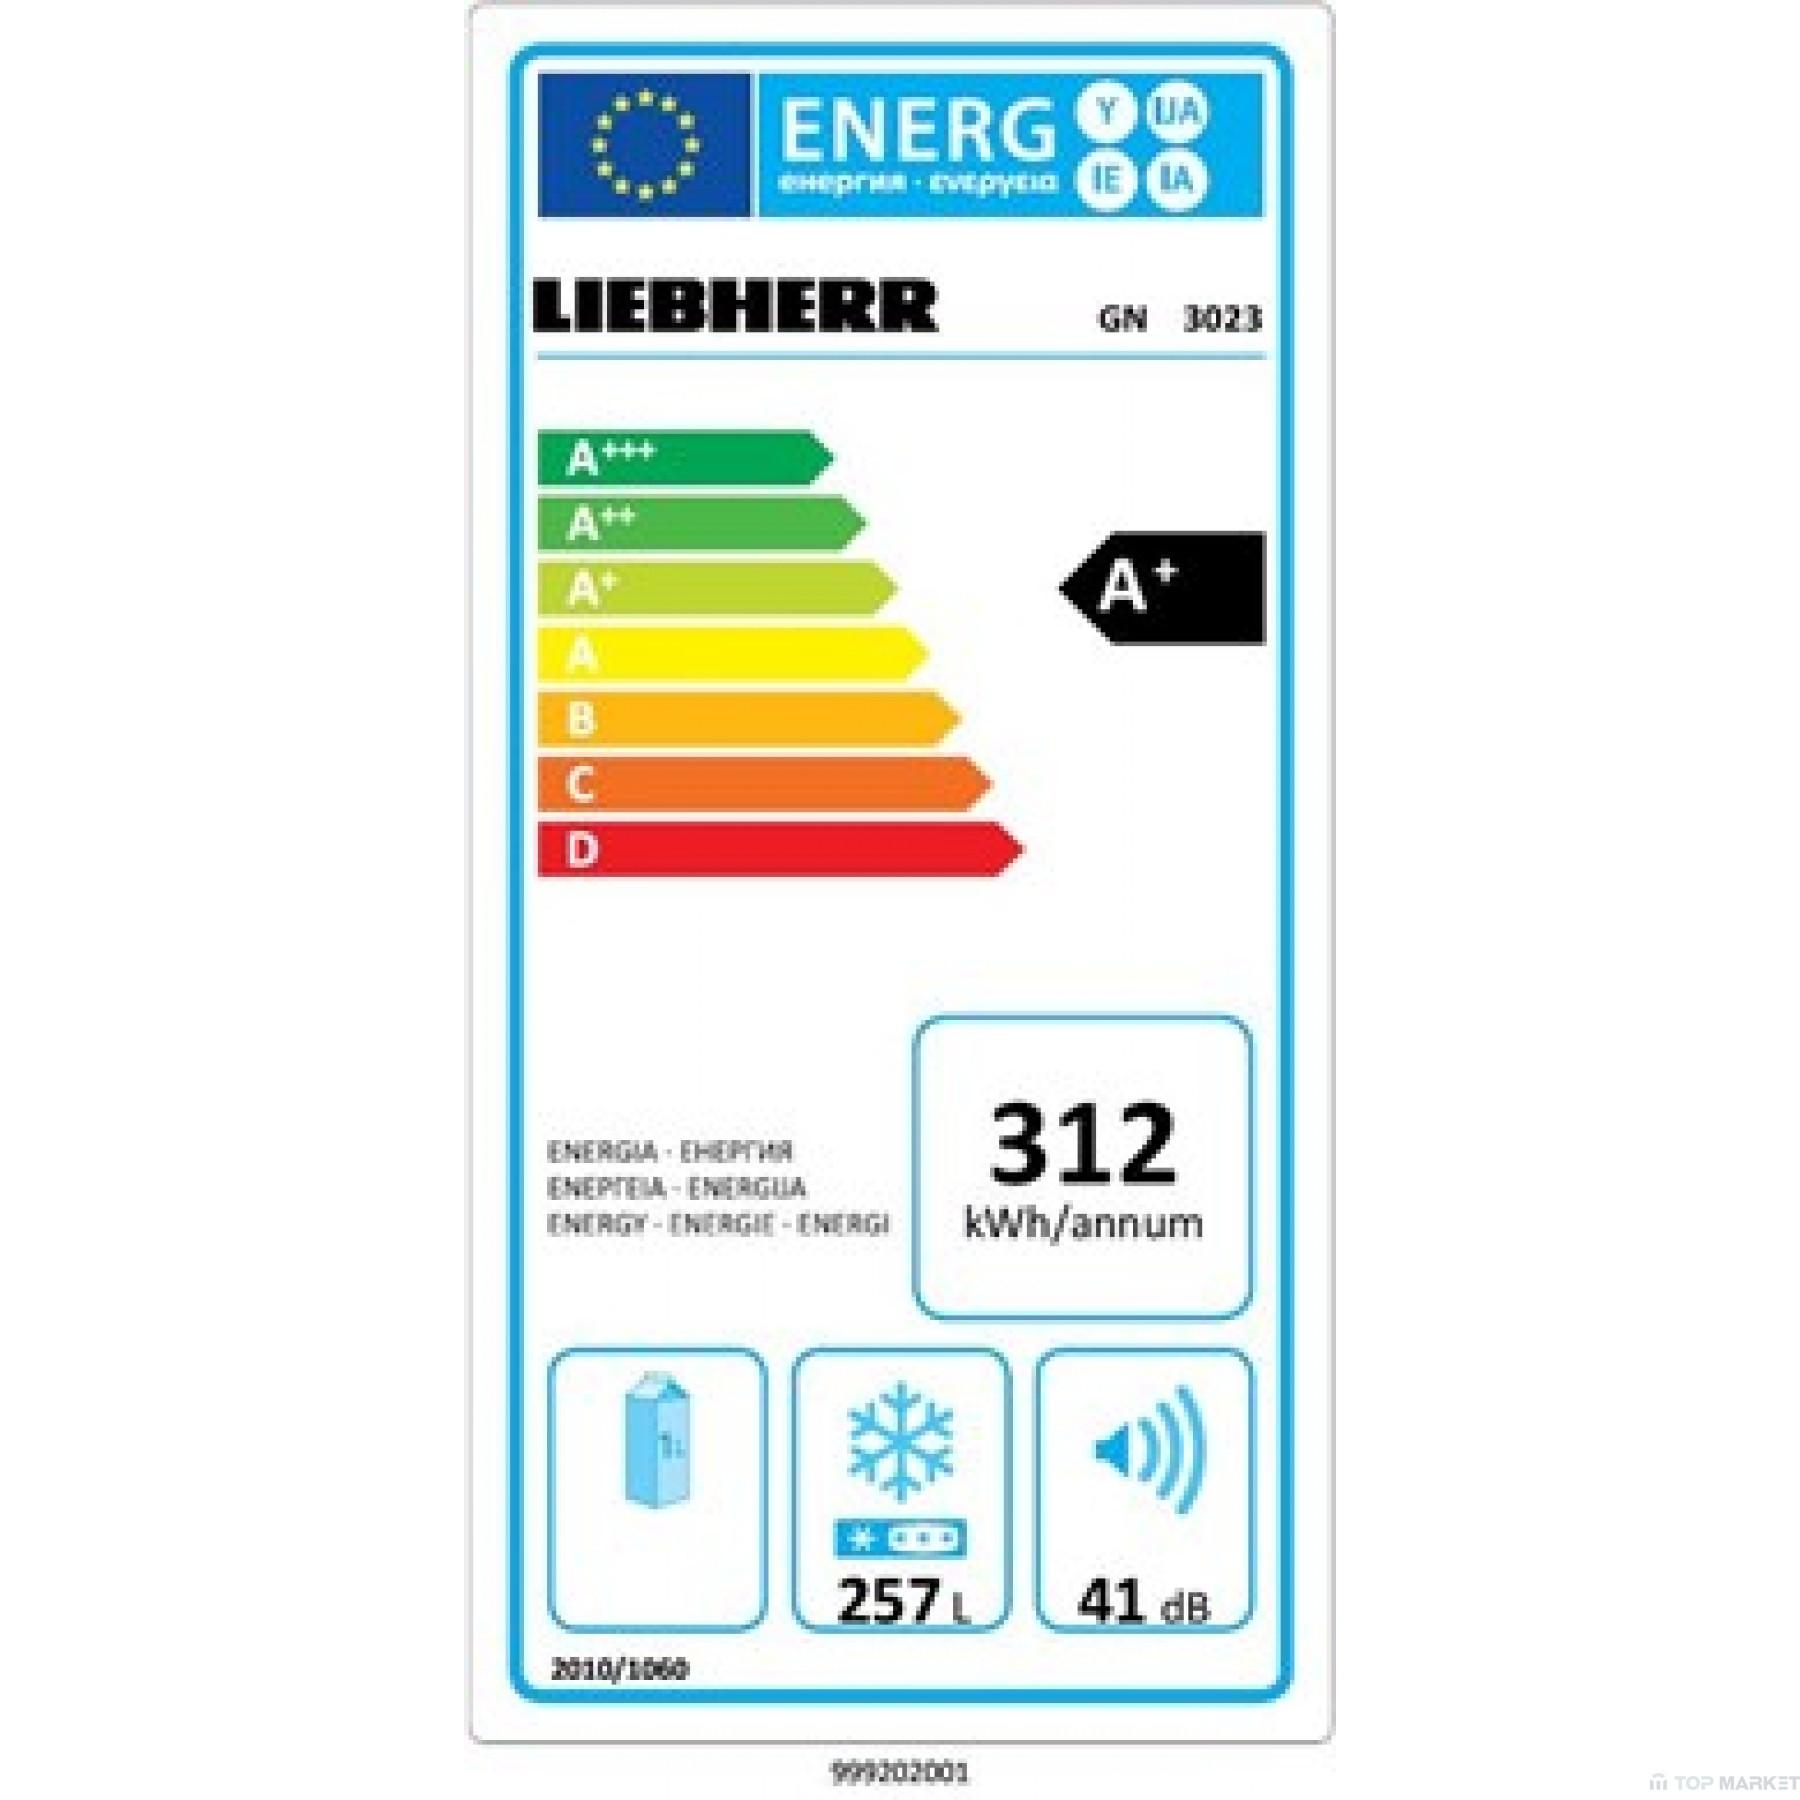 Фризер вертикален Liebherr GN3023